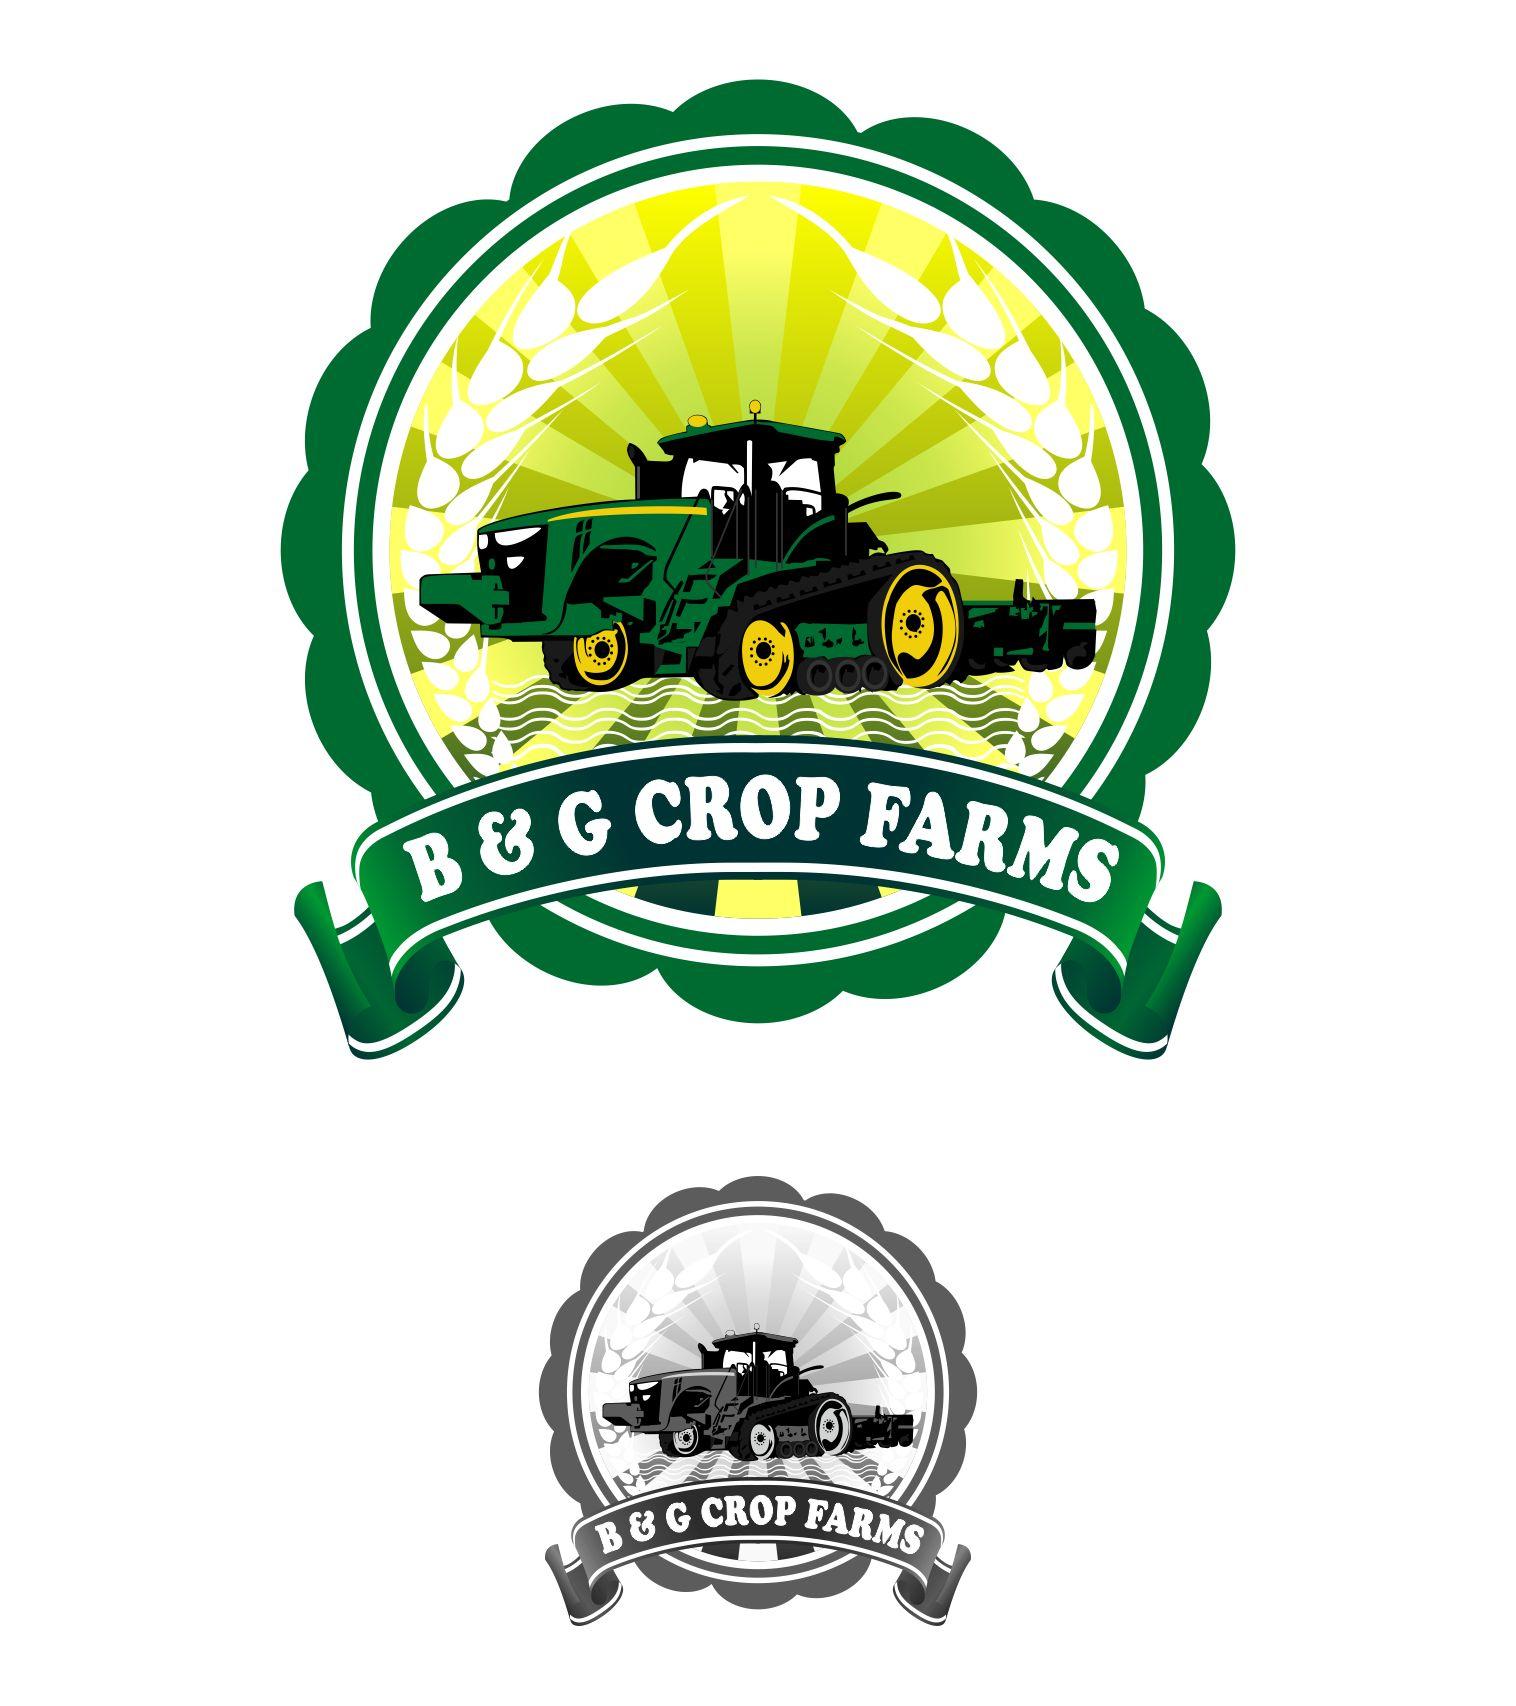 Logo Design by joca - Entry No. 58 in the Logo Design Contest Artistic Logo Design for B & G Crop Farms.